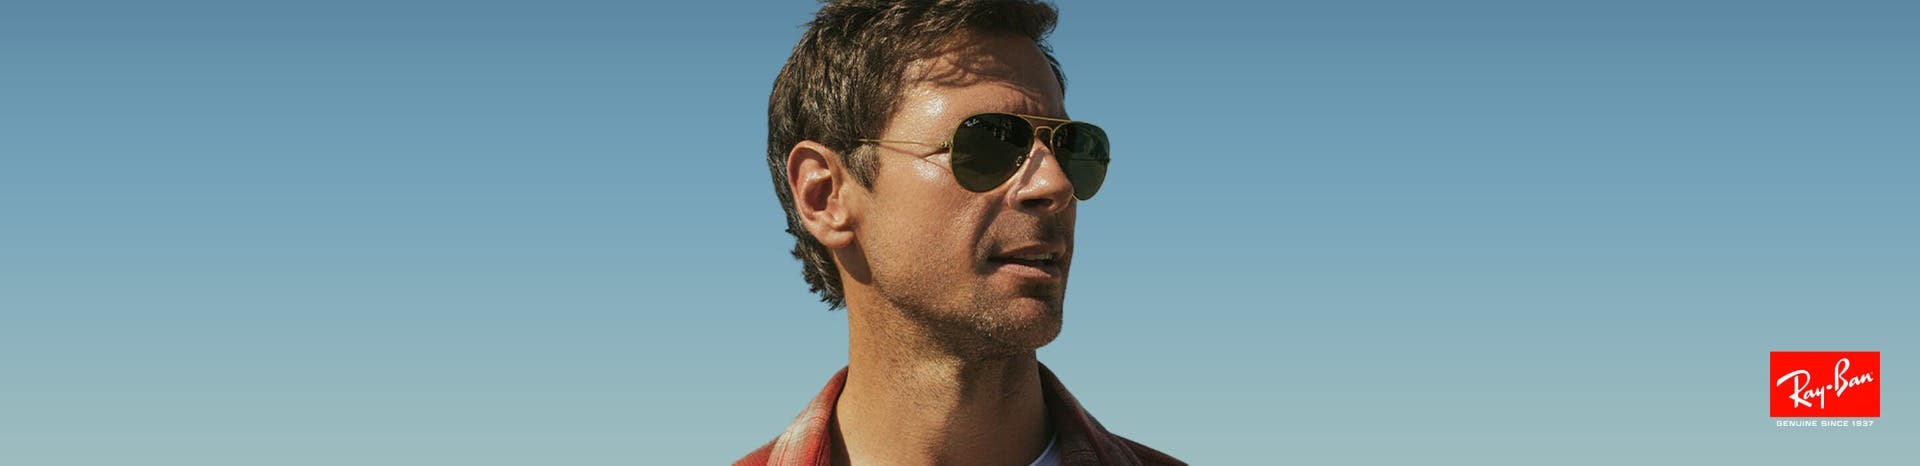 ray ban hiking sunglasses prescription